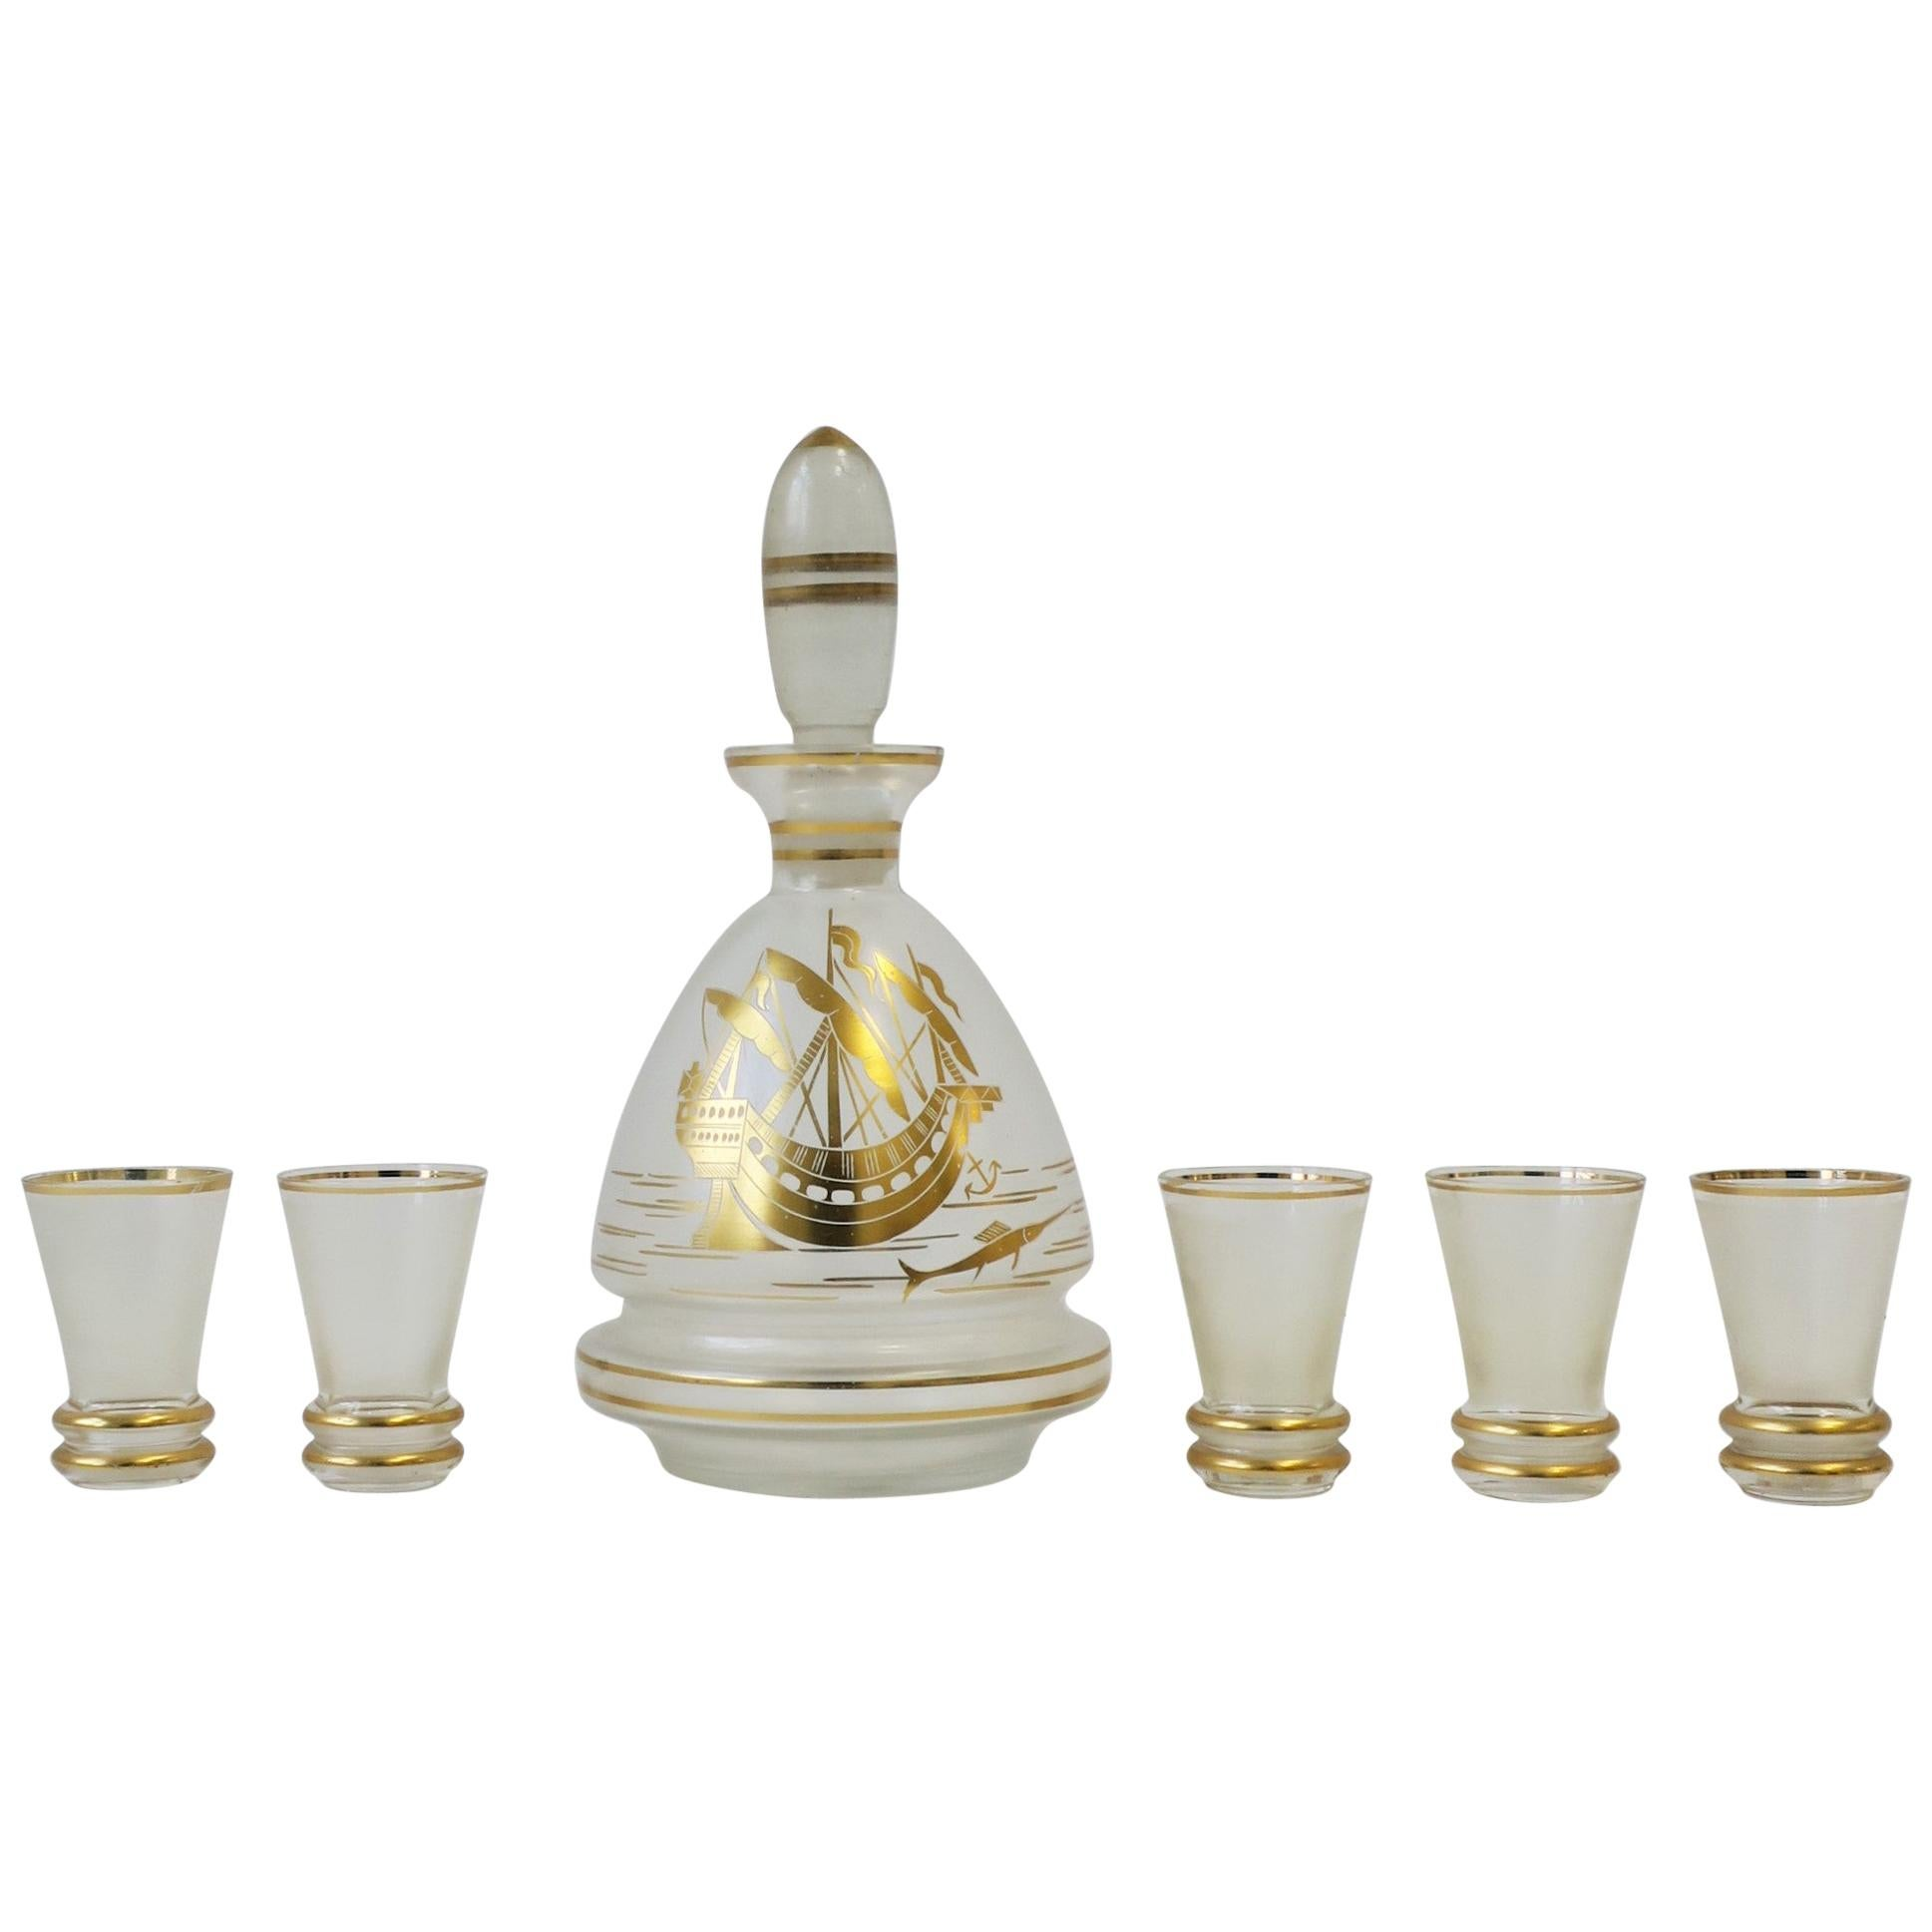 European Liquor Decanter and Shot Glass Set with Gold Nautical Design Barware